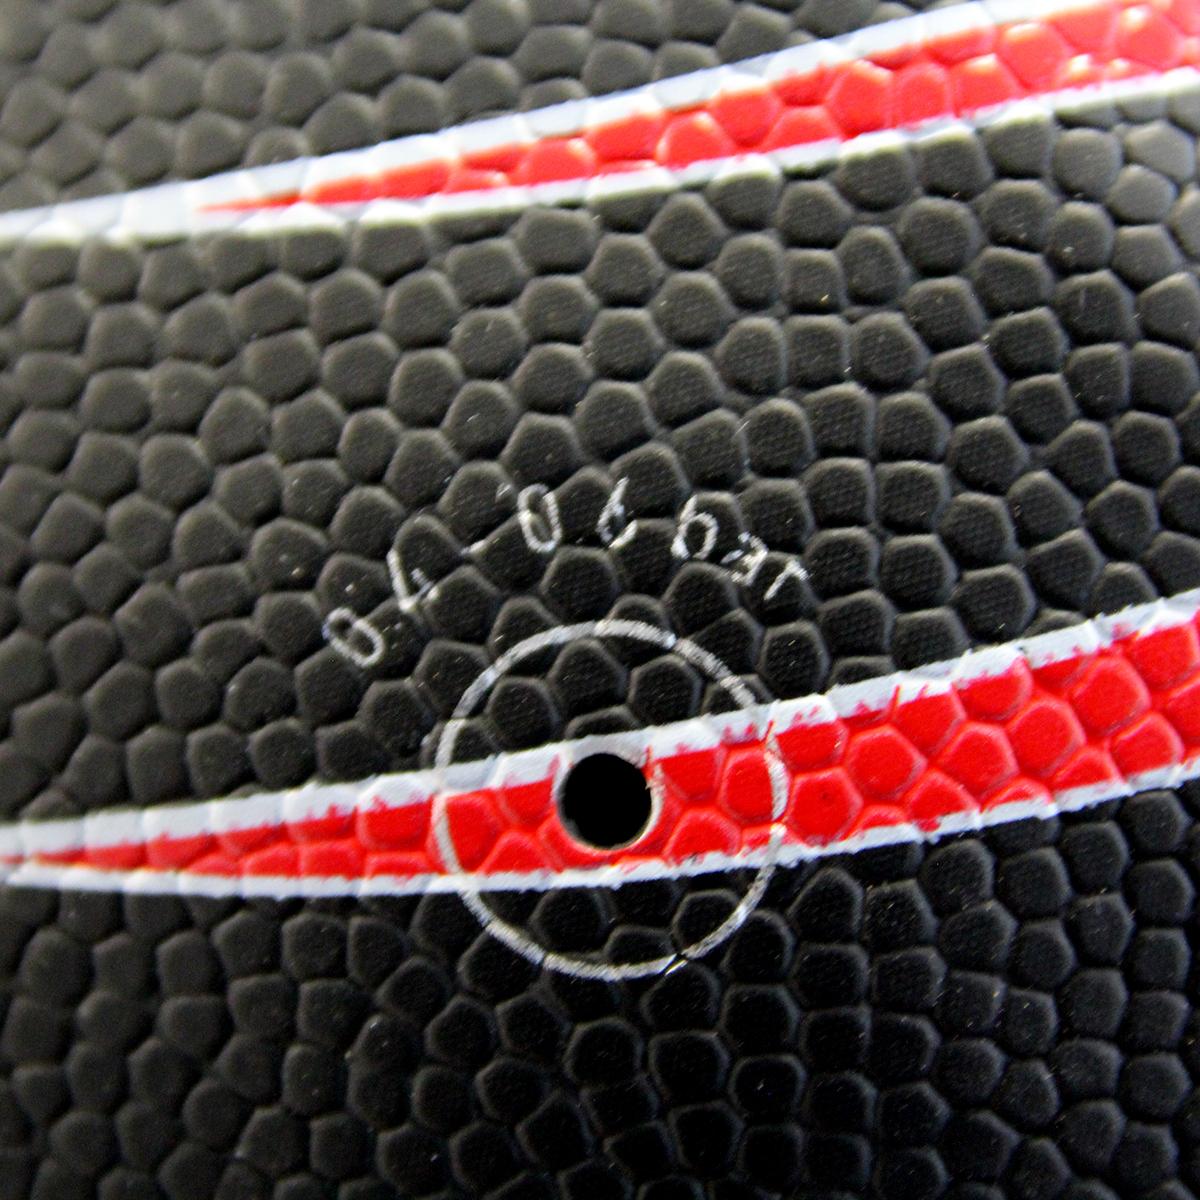 eb291ed584 Puma POWER CAT 3.10 HANDBALL Ballon de Handball Unisex Jaune Noir Rouge 4 4  sur 5 Voir Plus